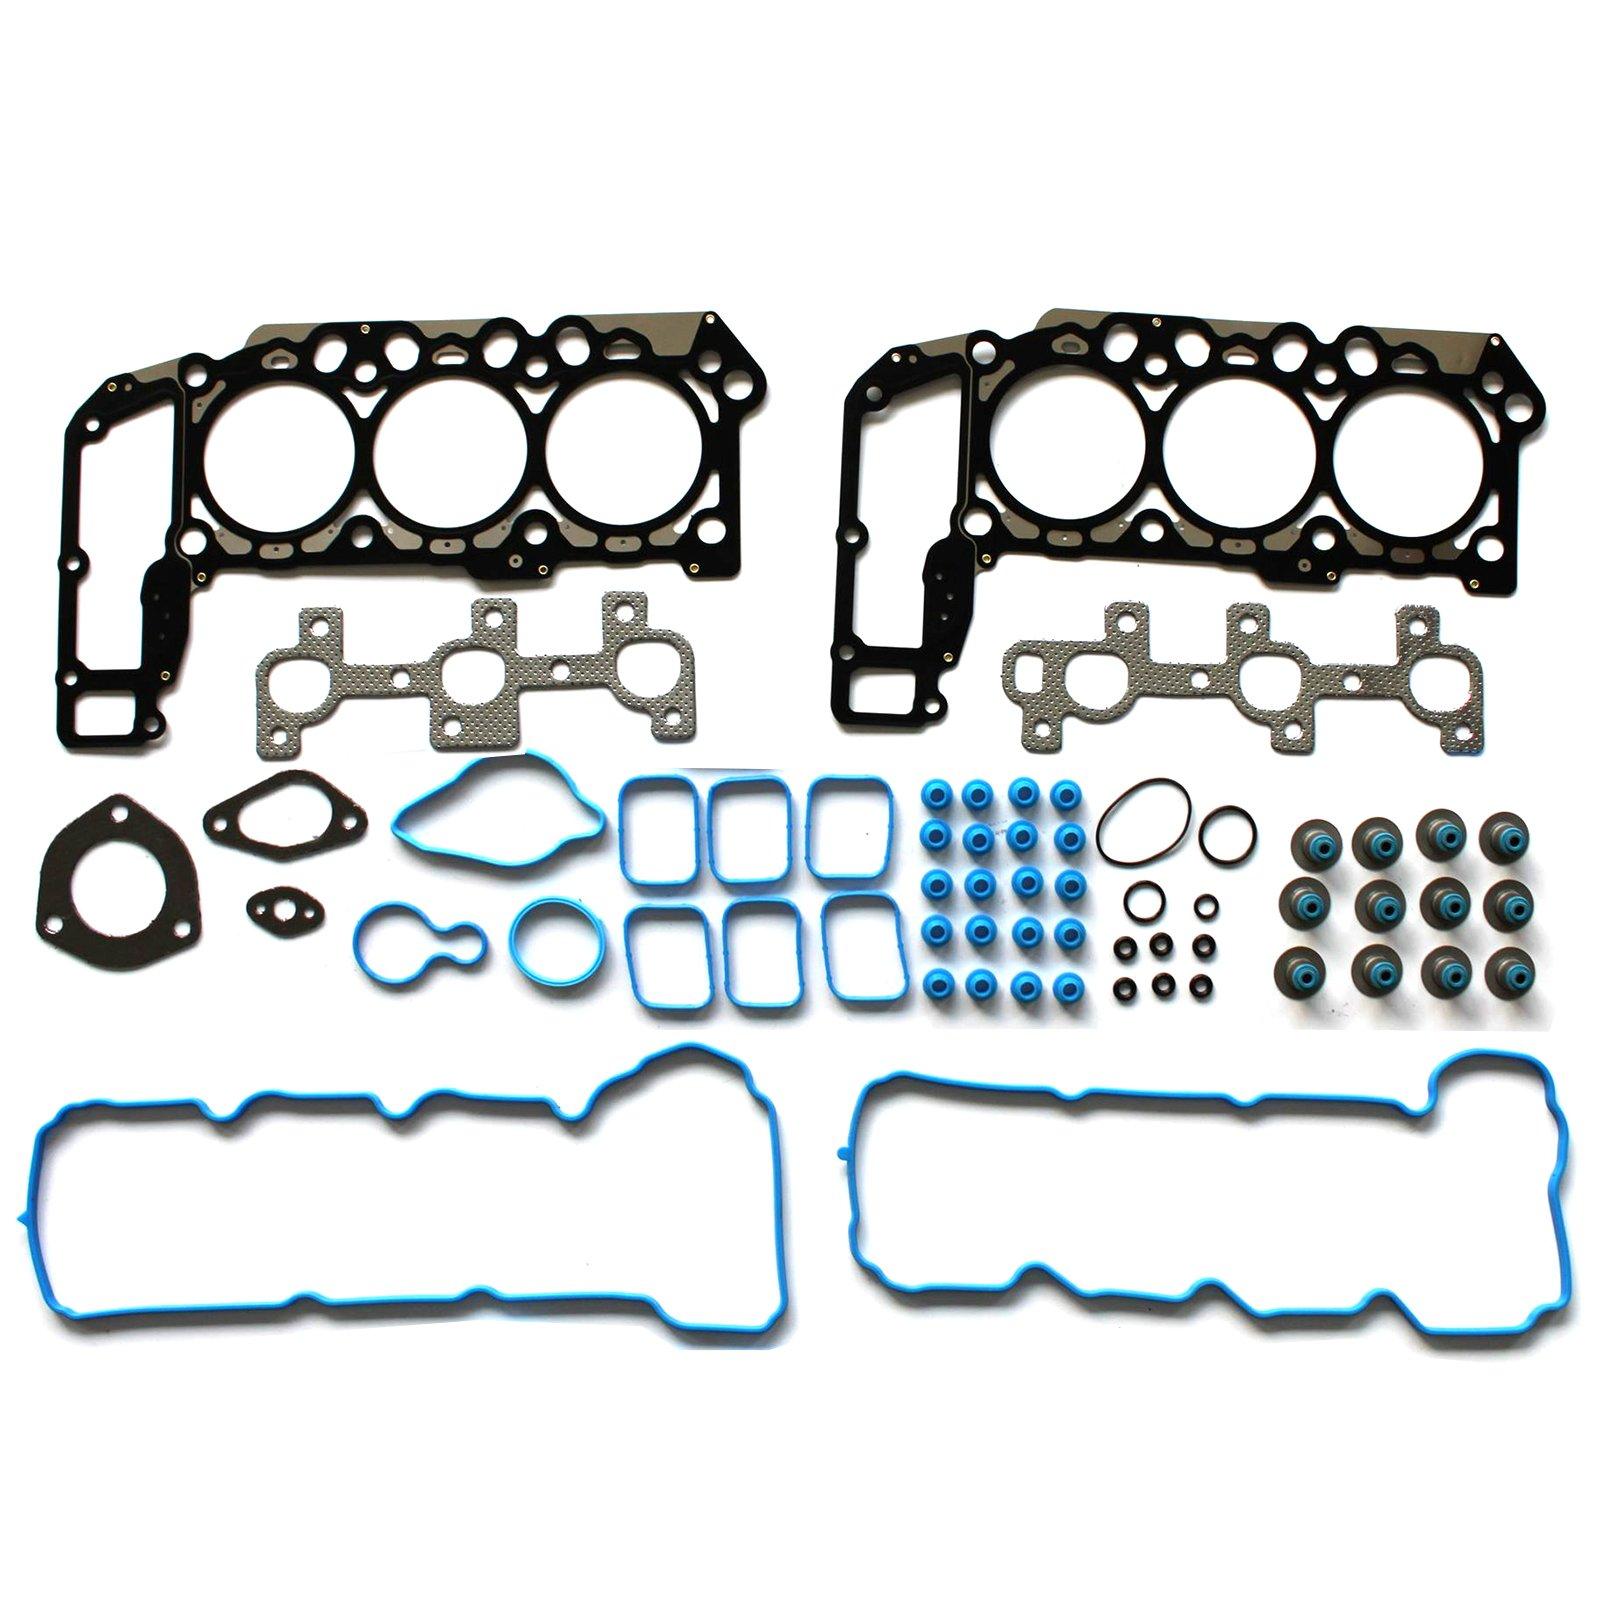 ECCPP Compatible fit for Engine Cylinder Head Gasket Set for VIN K 2005-2012 Dodge Jeep Mitsubishi Ram 3.7L Engine Valve Covers Gaskets Kit